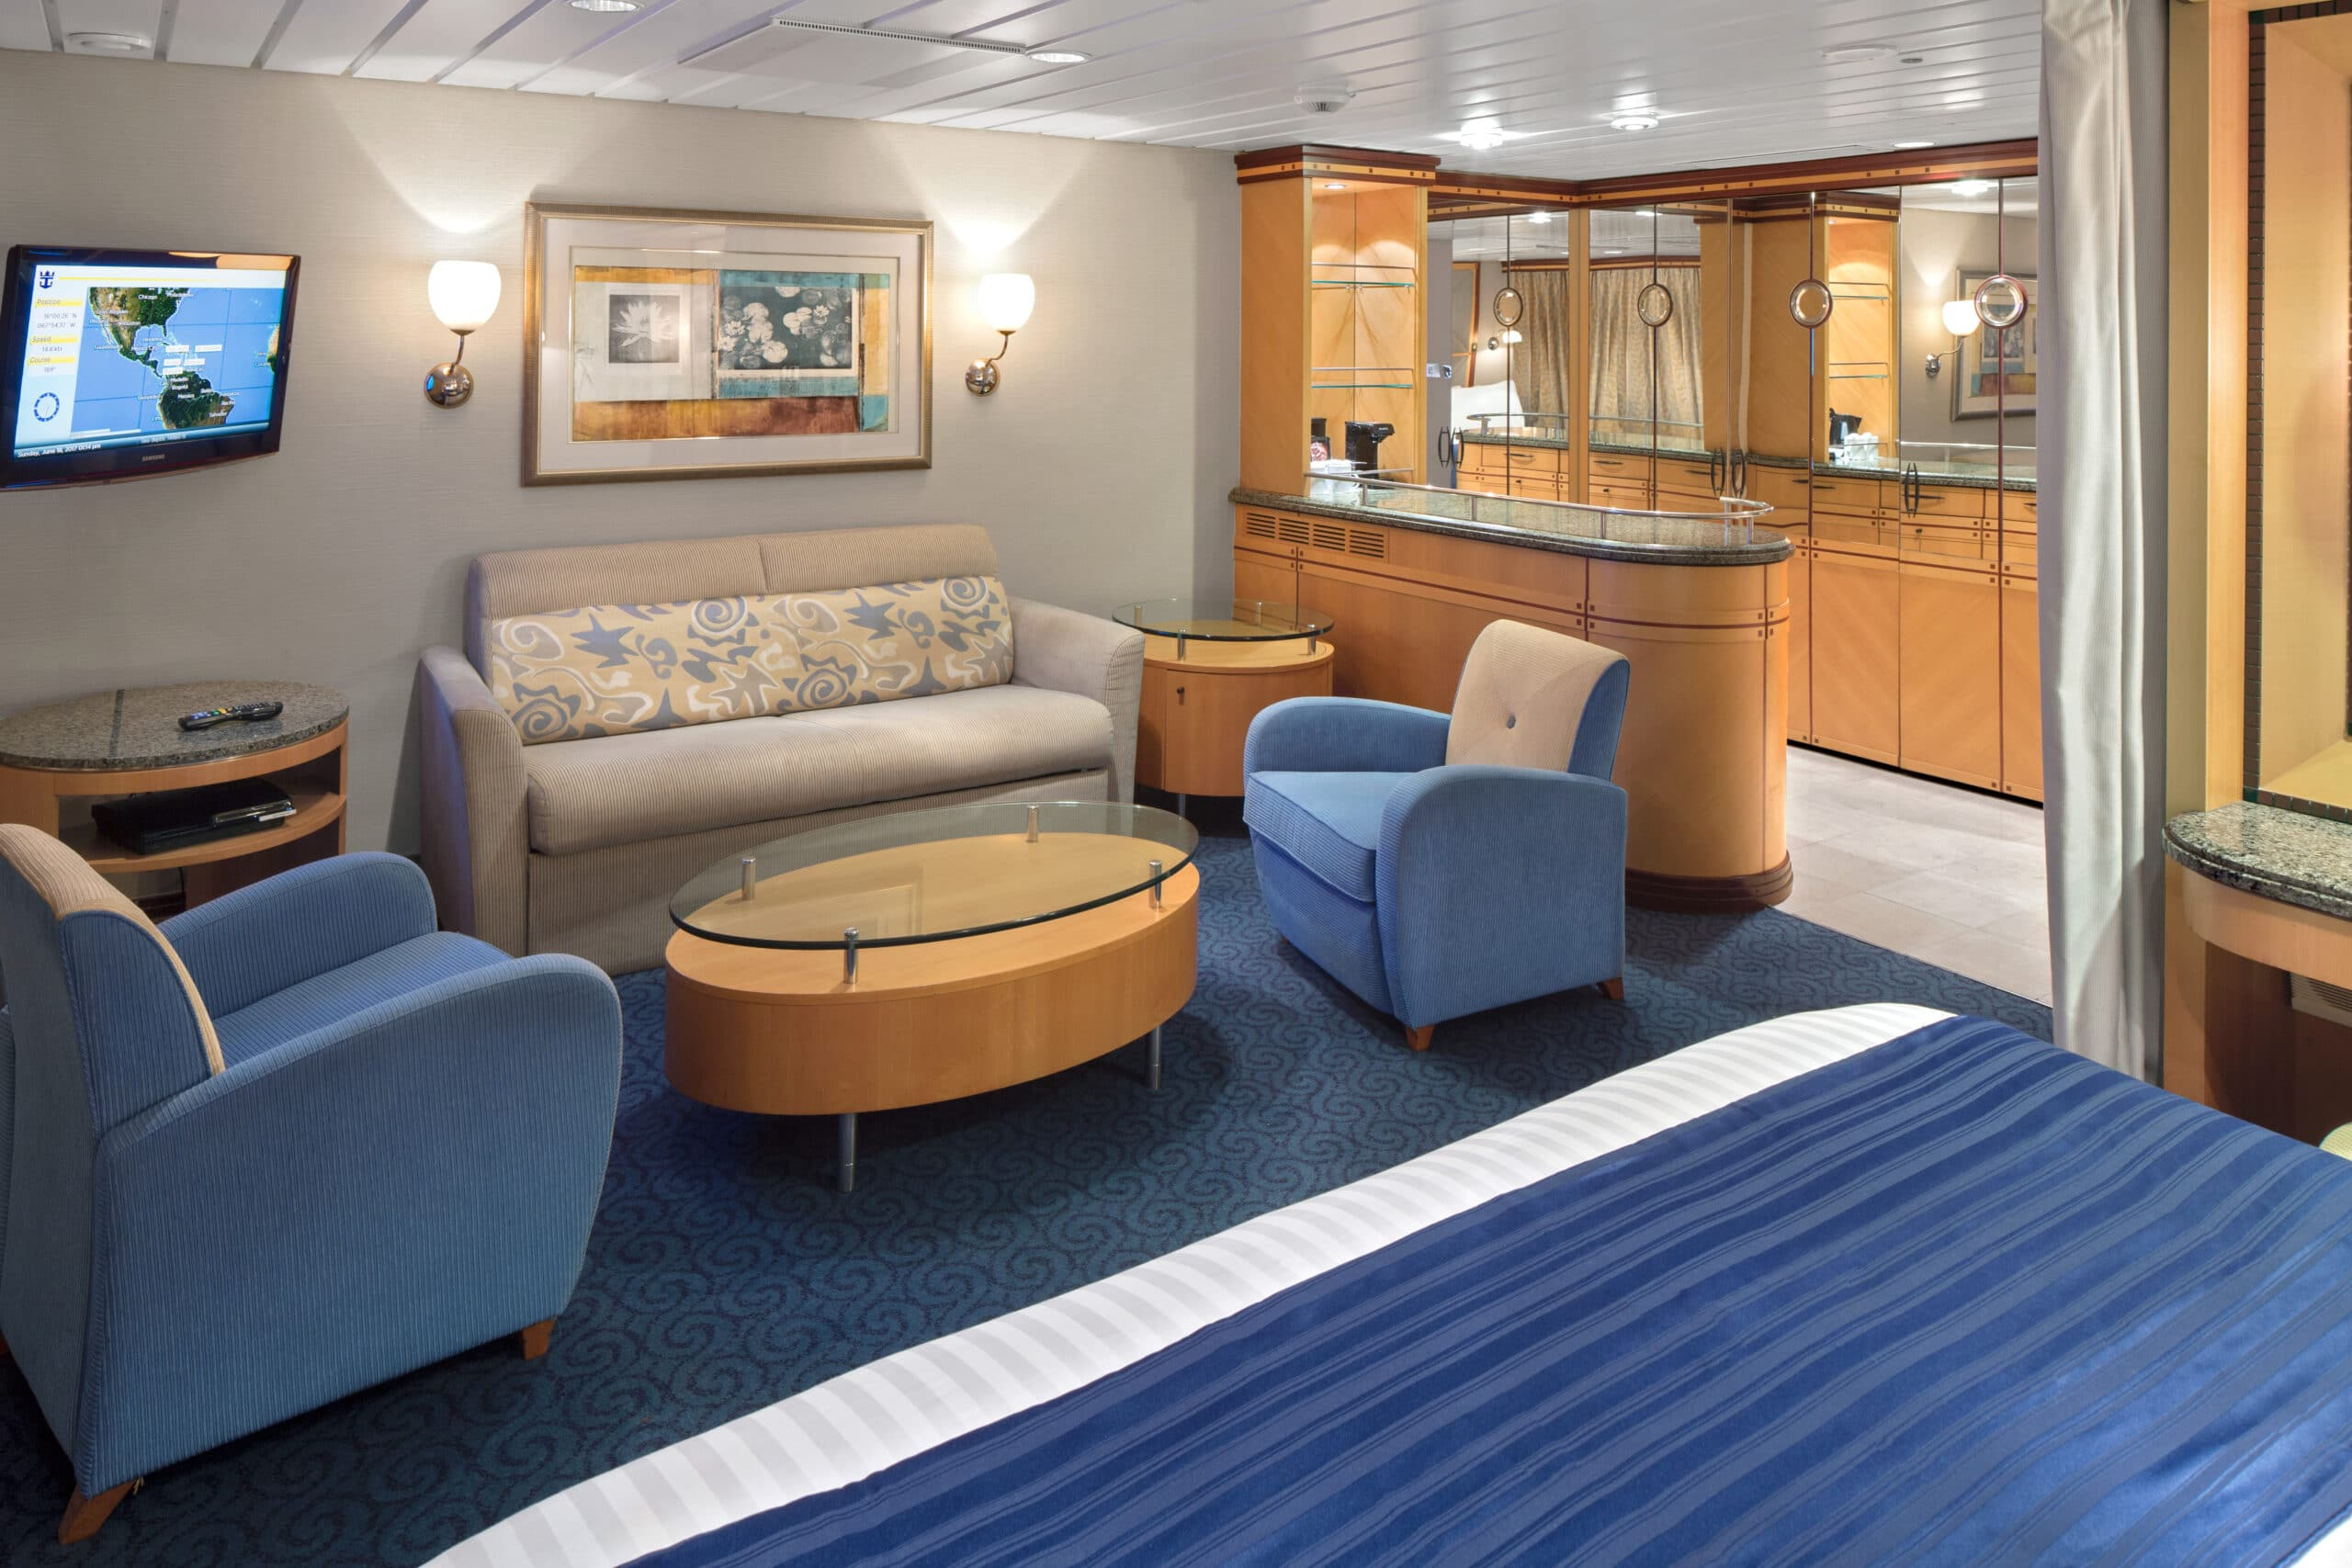 Royal-Caribbean-International-Adventure-of-the-Seas-schip-cruiseschip-categorie-GT-Grand-Suite-2-bedroom